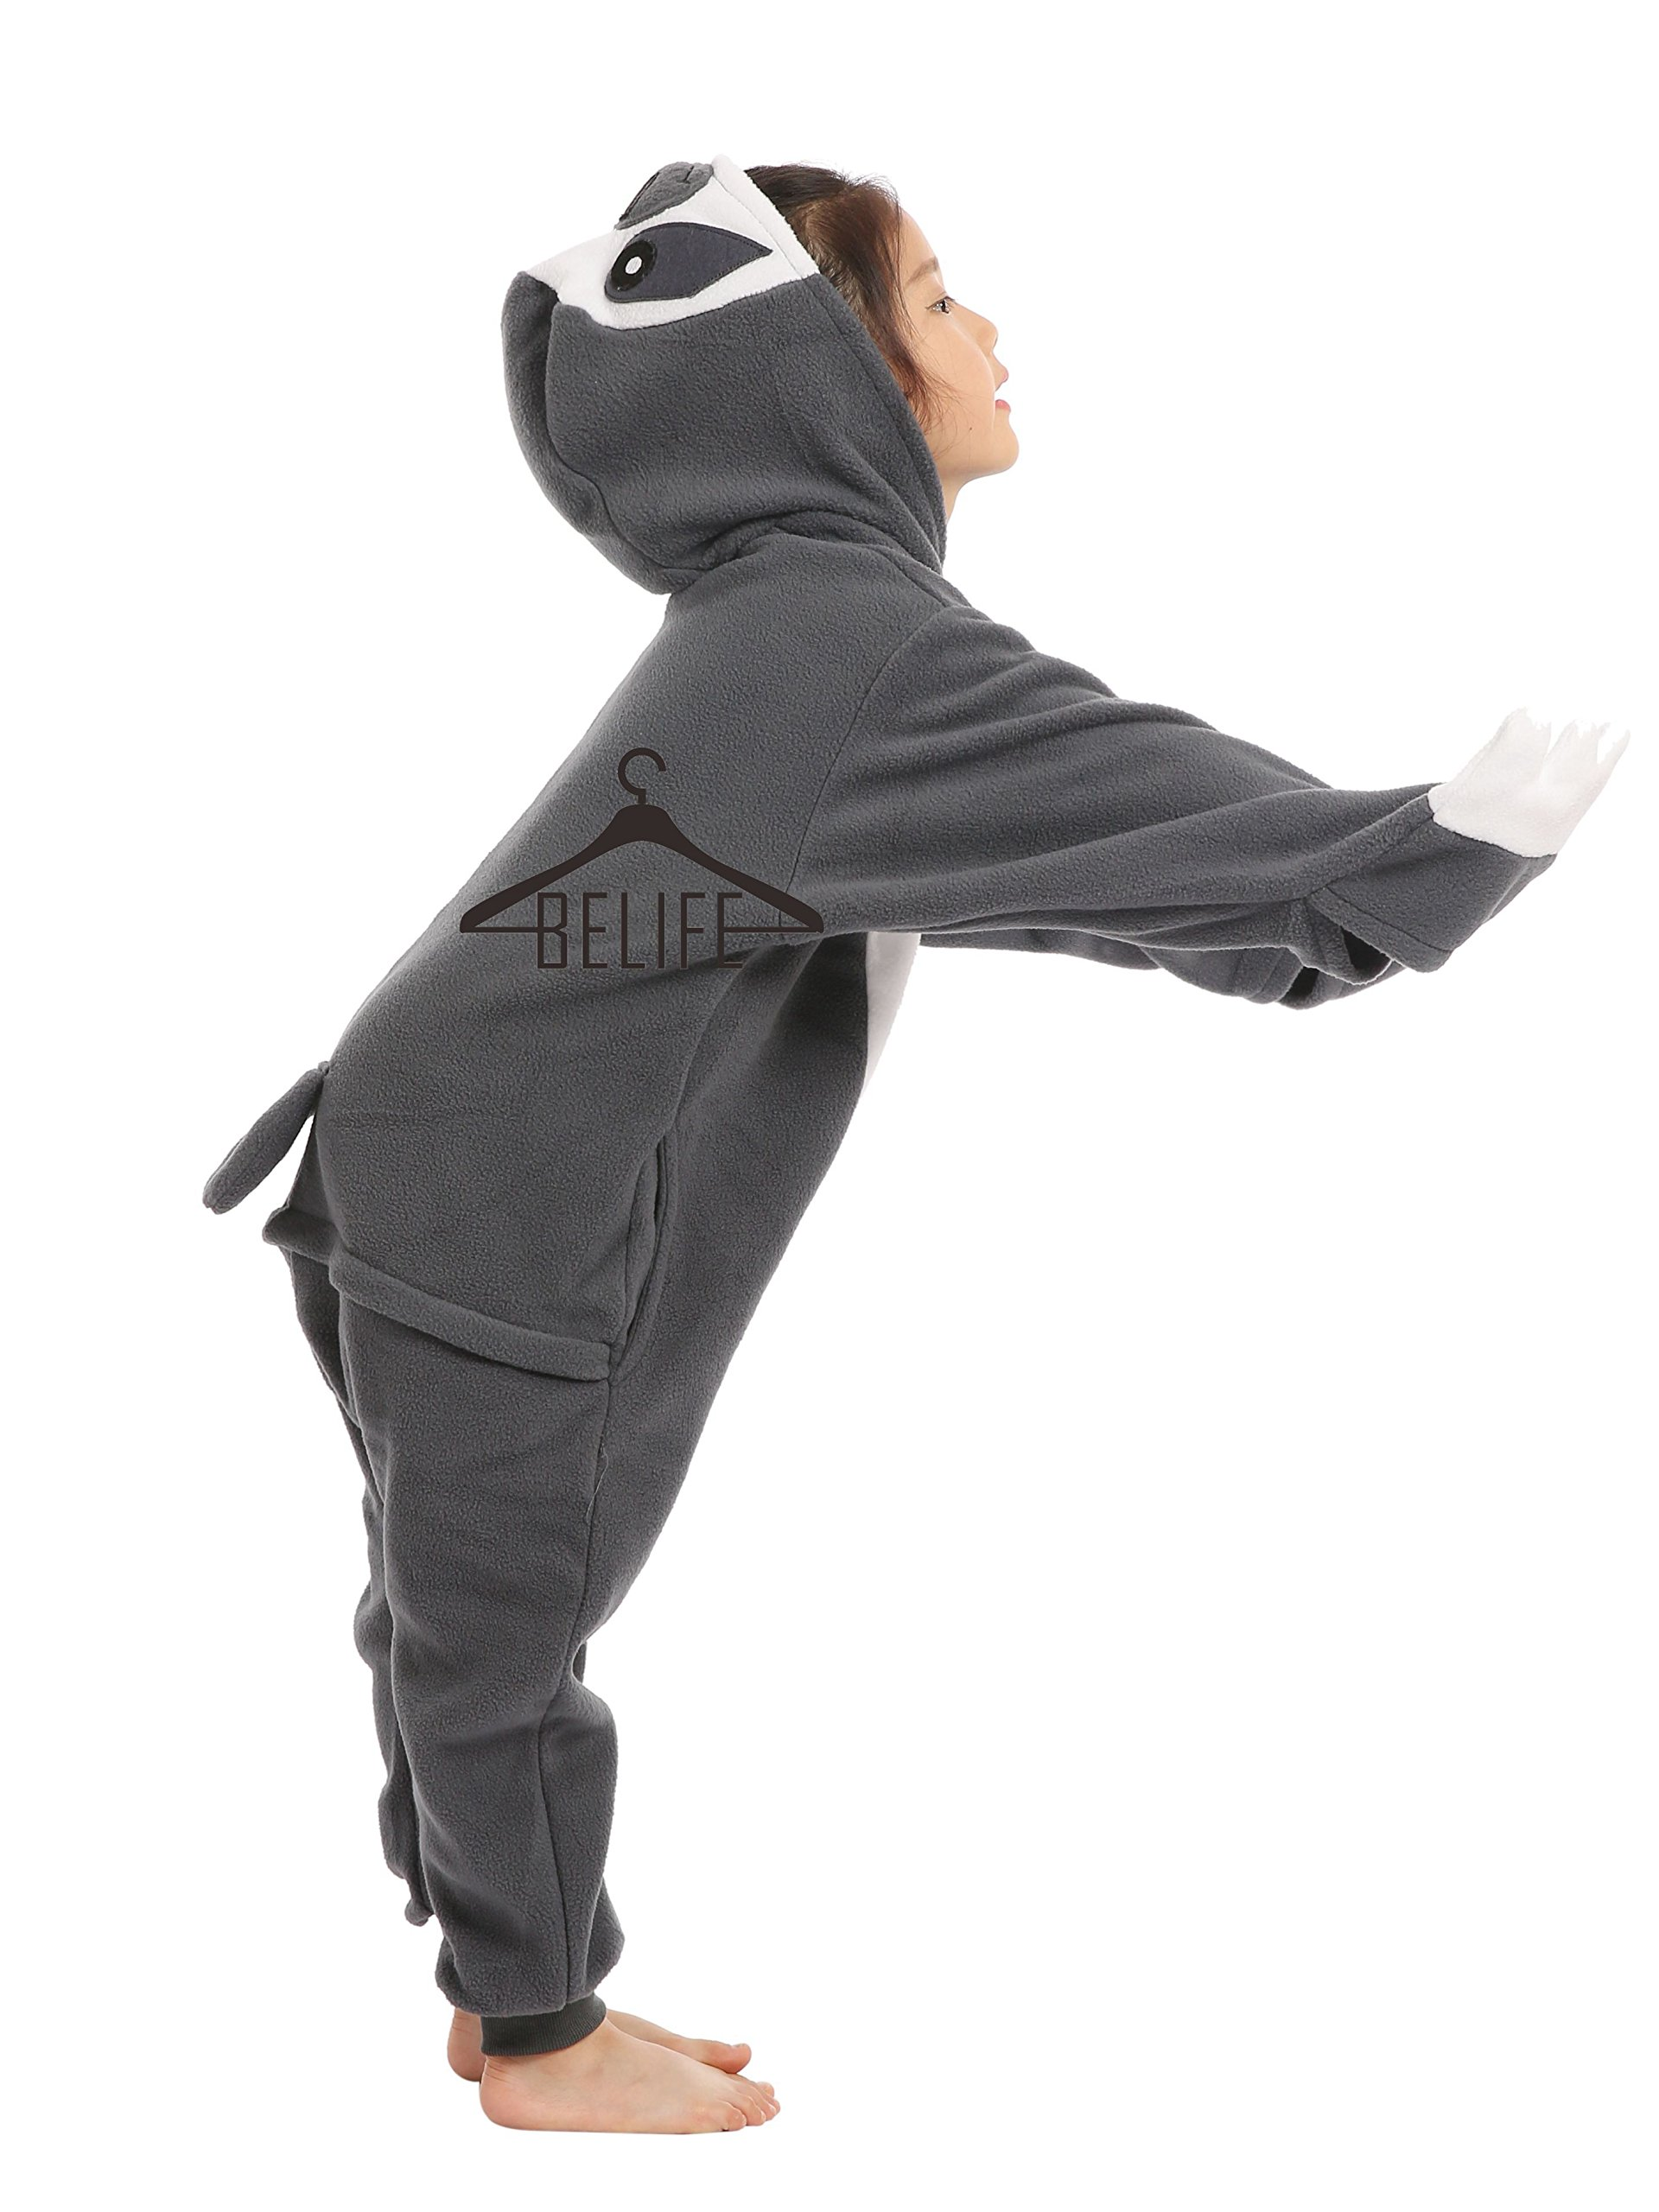 BELIFECOS Unisex Parent-Child Outfit Kids Sloth Cosplay Costume Onesie Pajamas